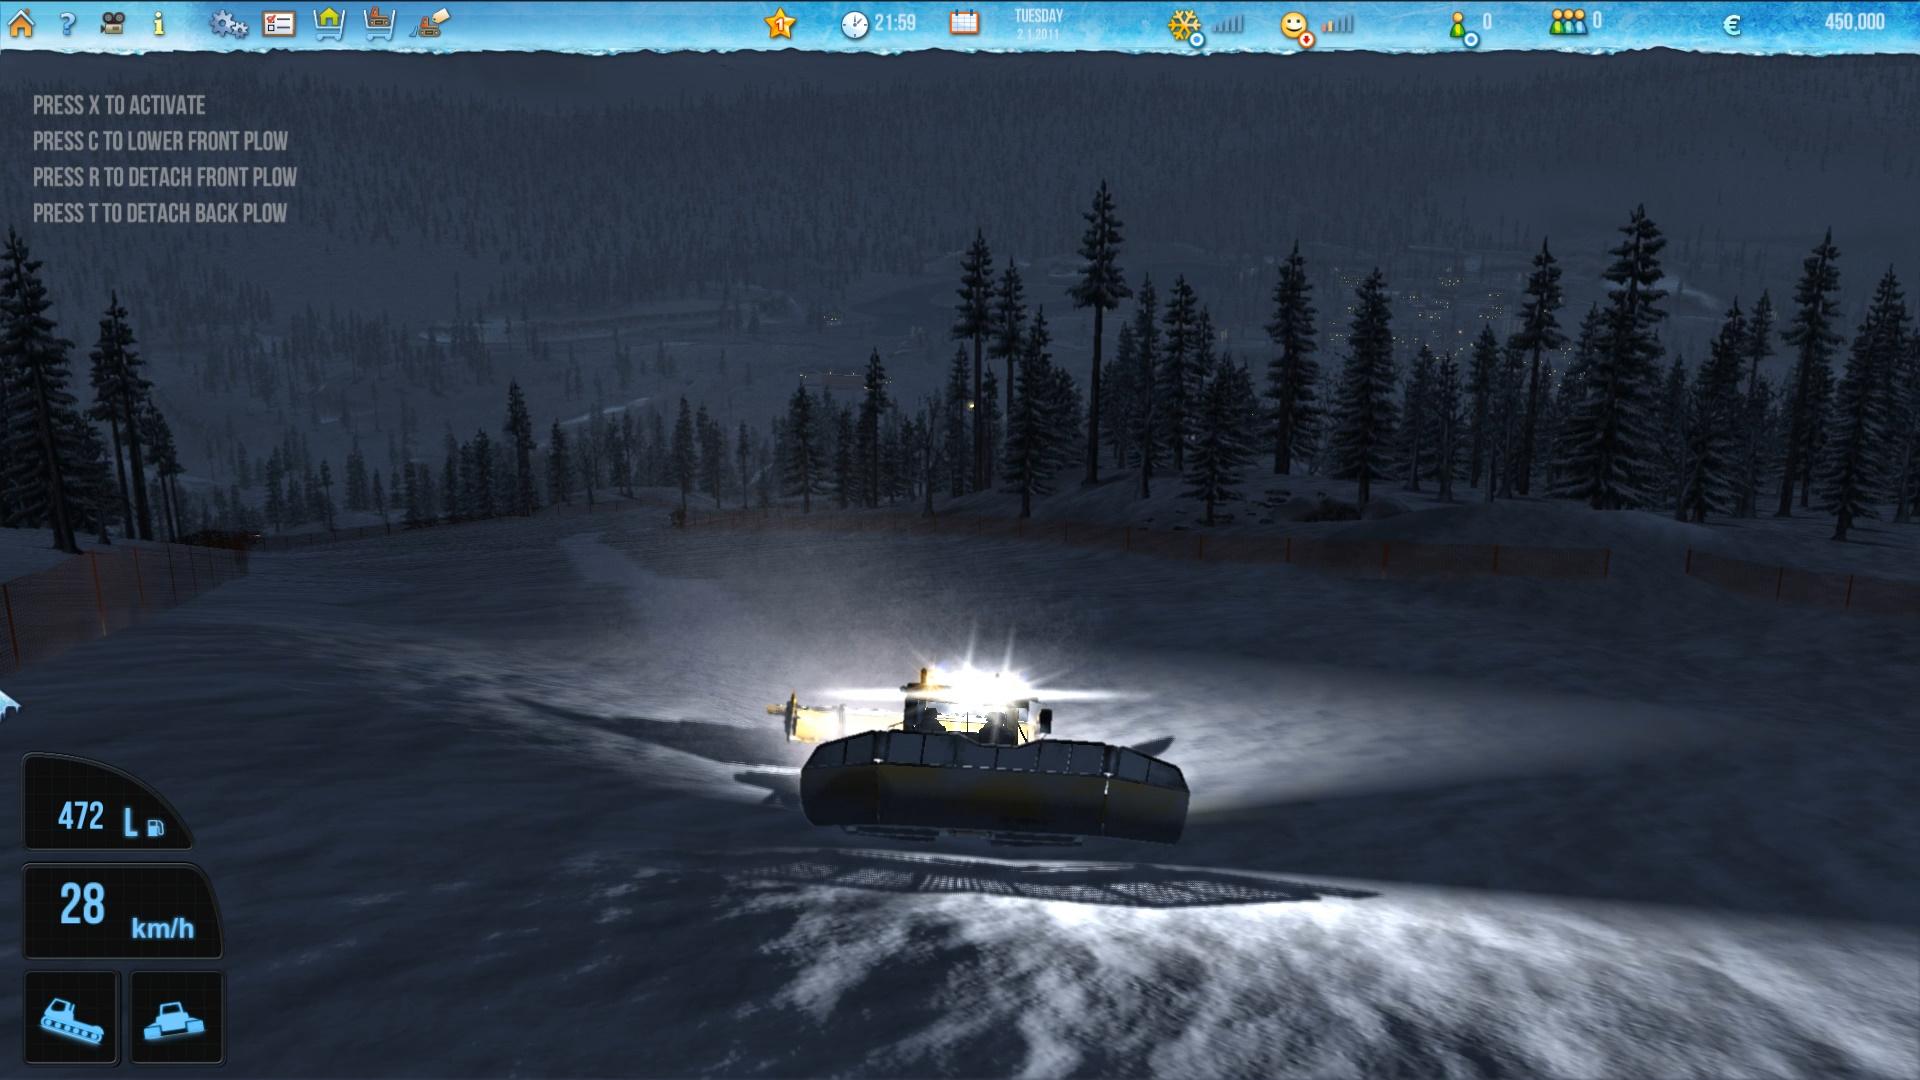 Ski-World Simulator screenshot